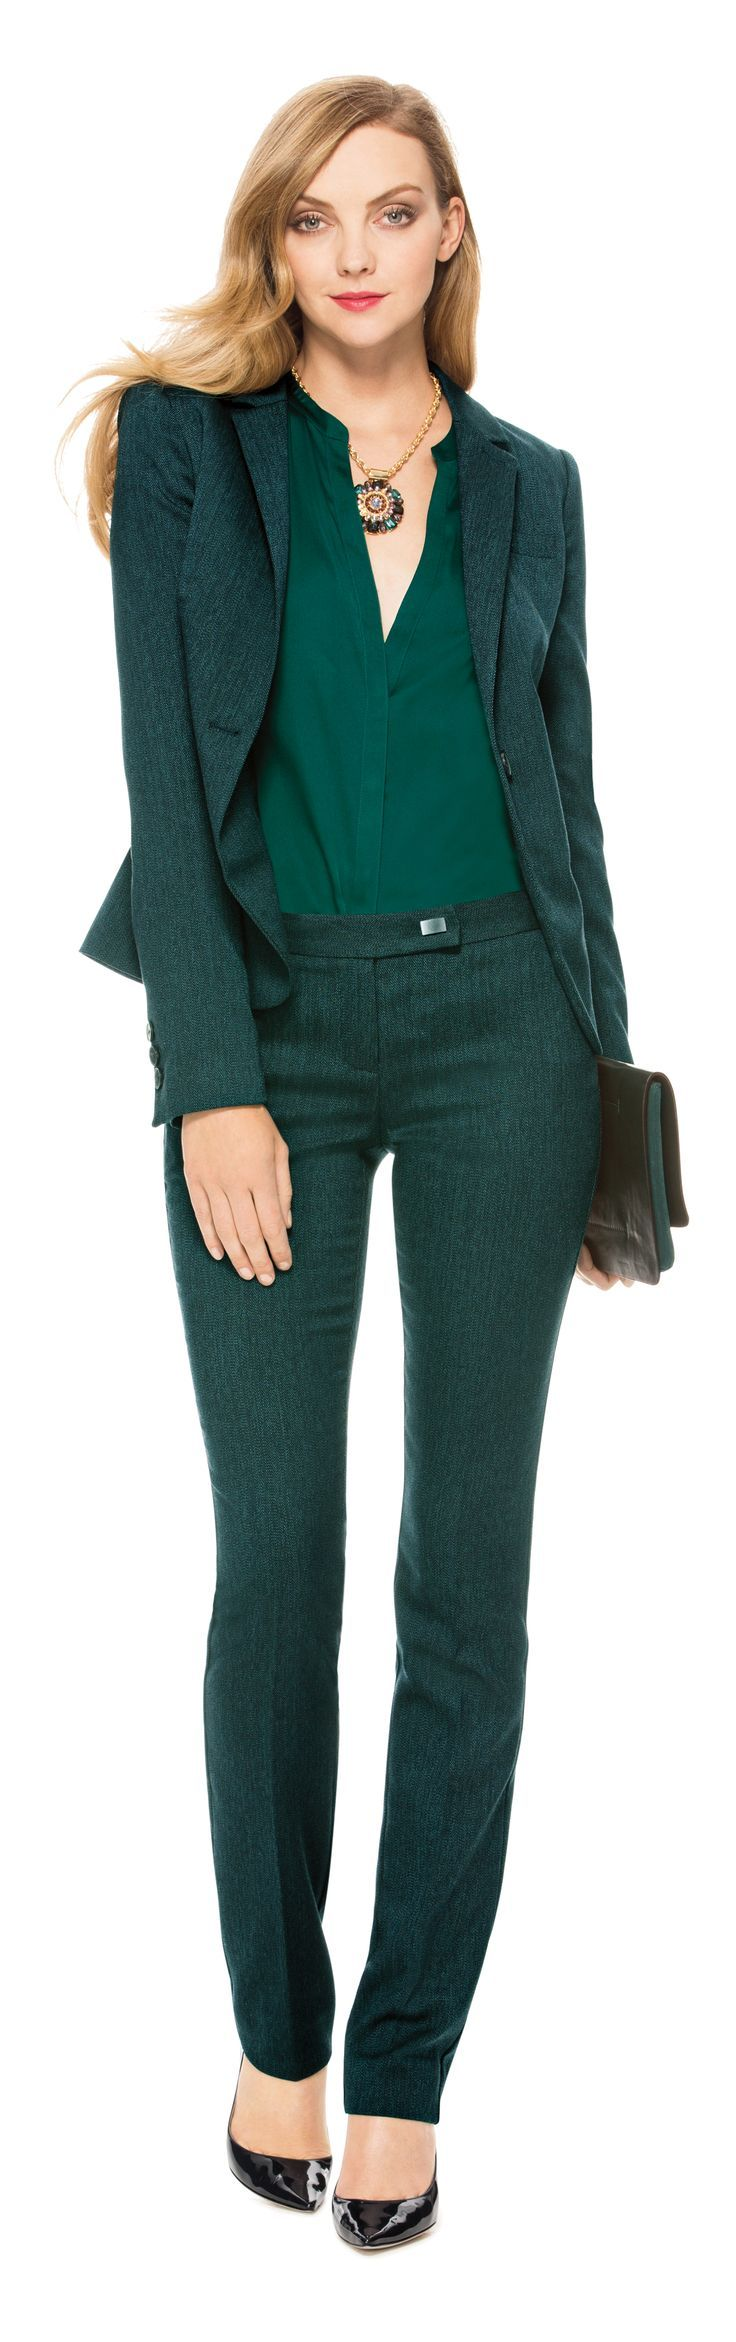 green-dark-slim-pants-green-dark-top-blouse-green-dark-jacket-blazer-howtowear-fashion-style-outfit-fall-winter-black-shoe-pumps-office-necklace-mono-blonde-work.jpg